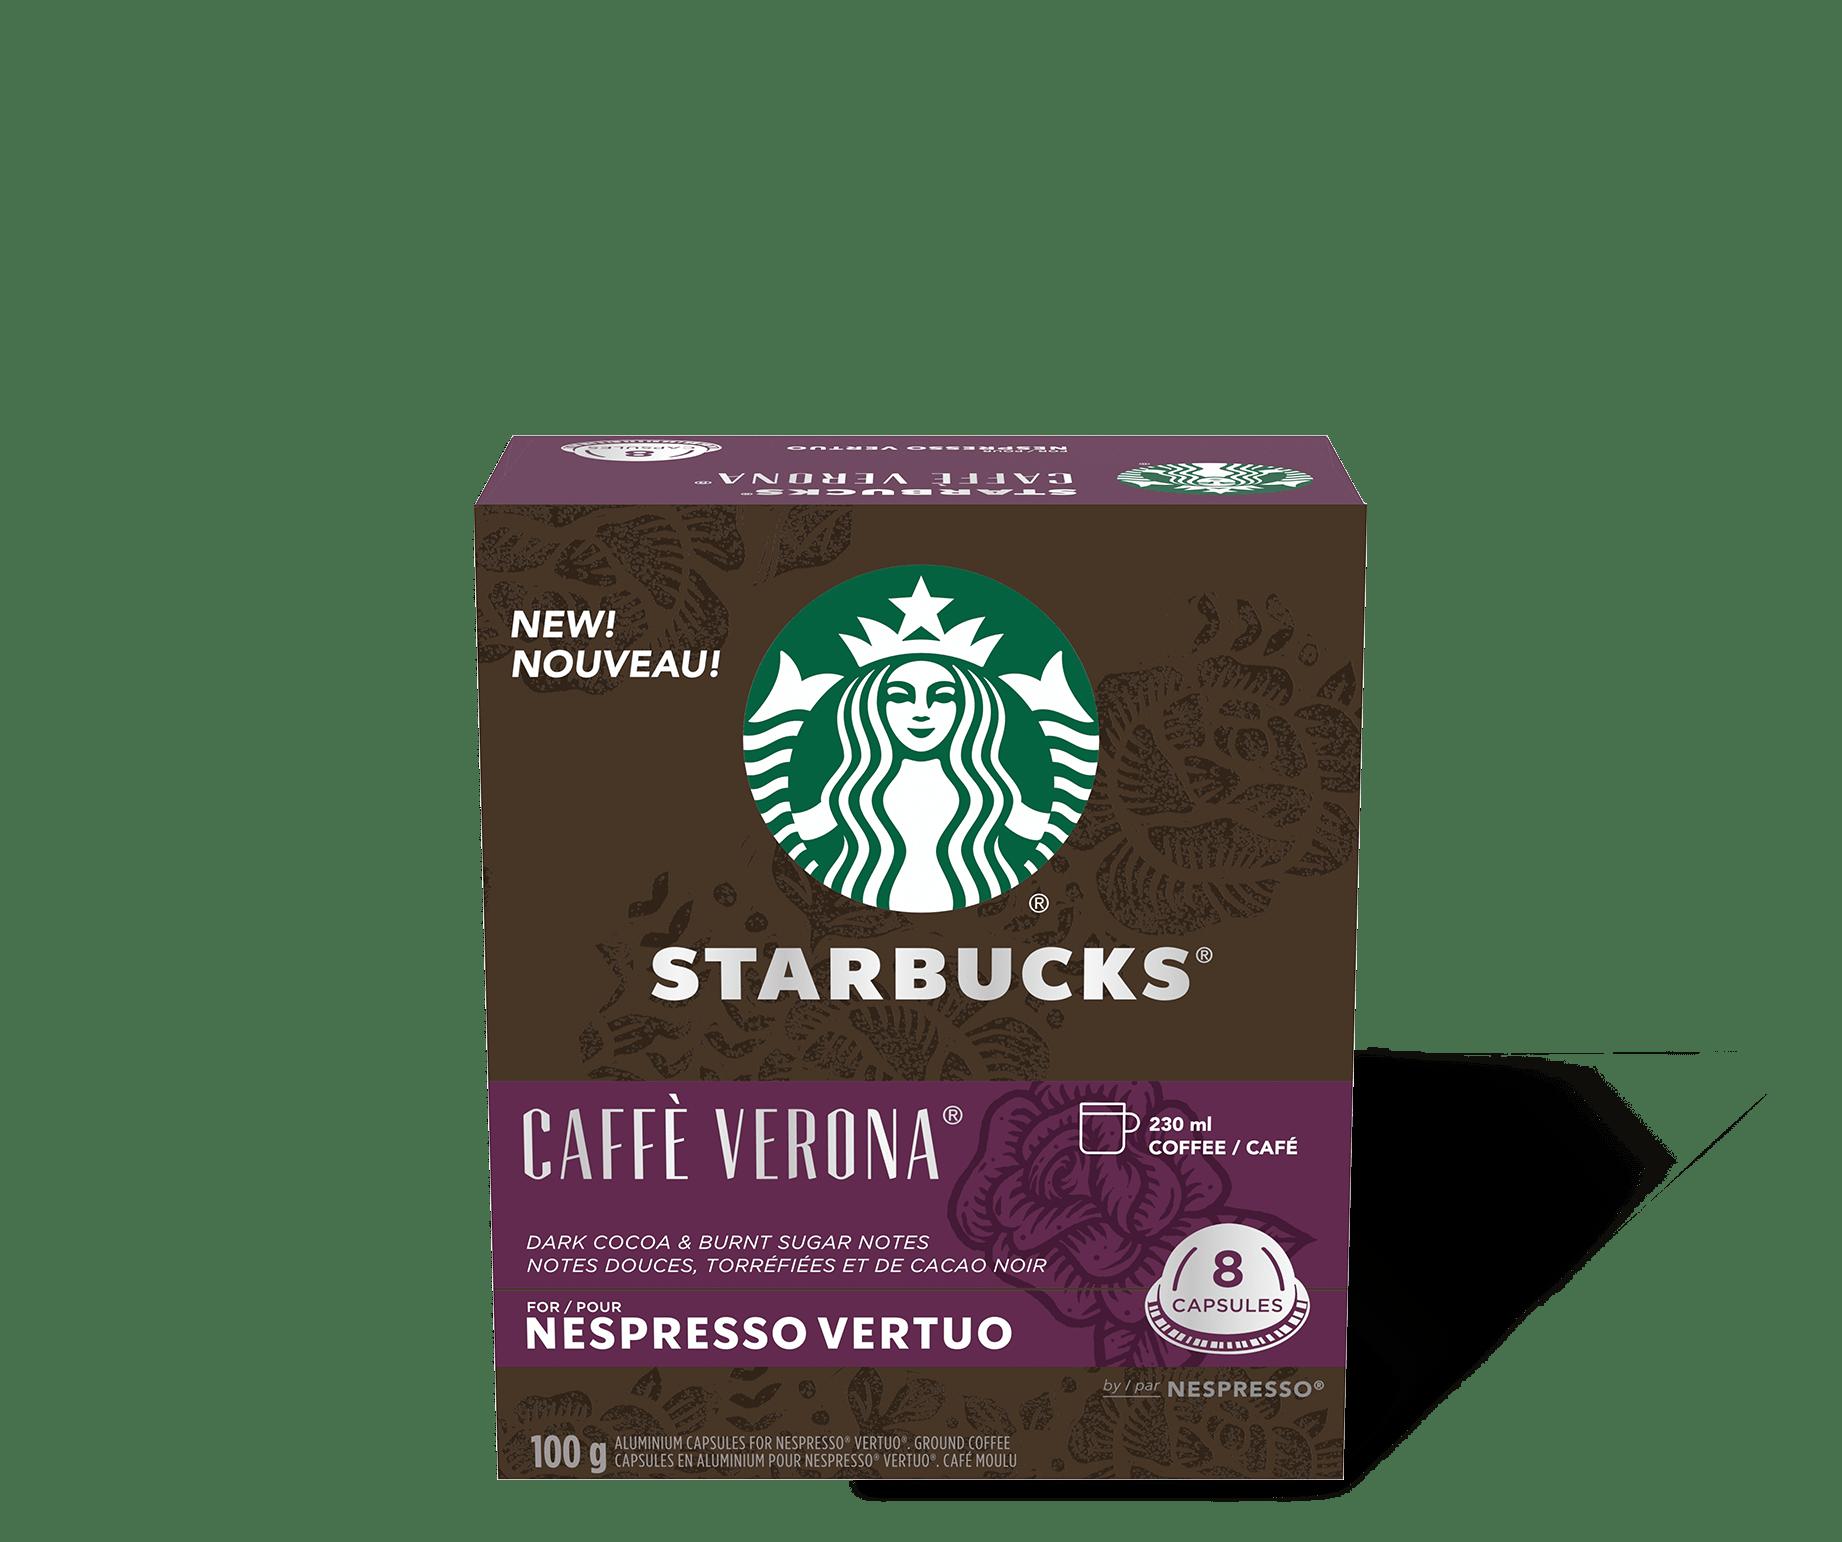 Starbucks by Nespresso Vertuo Caffe Verona